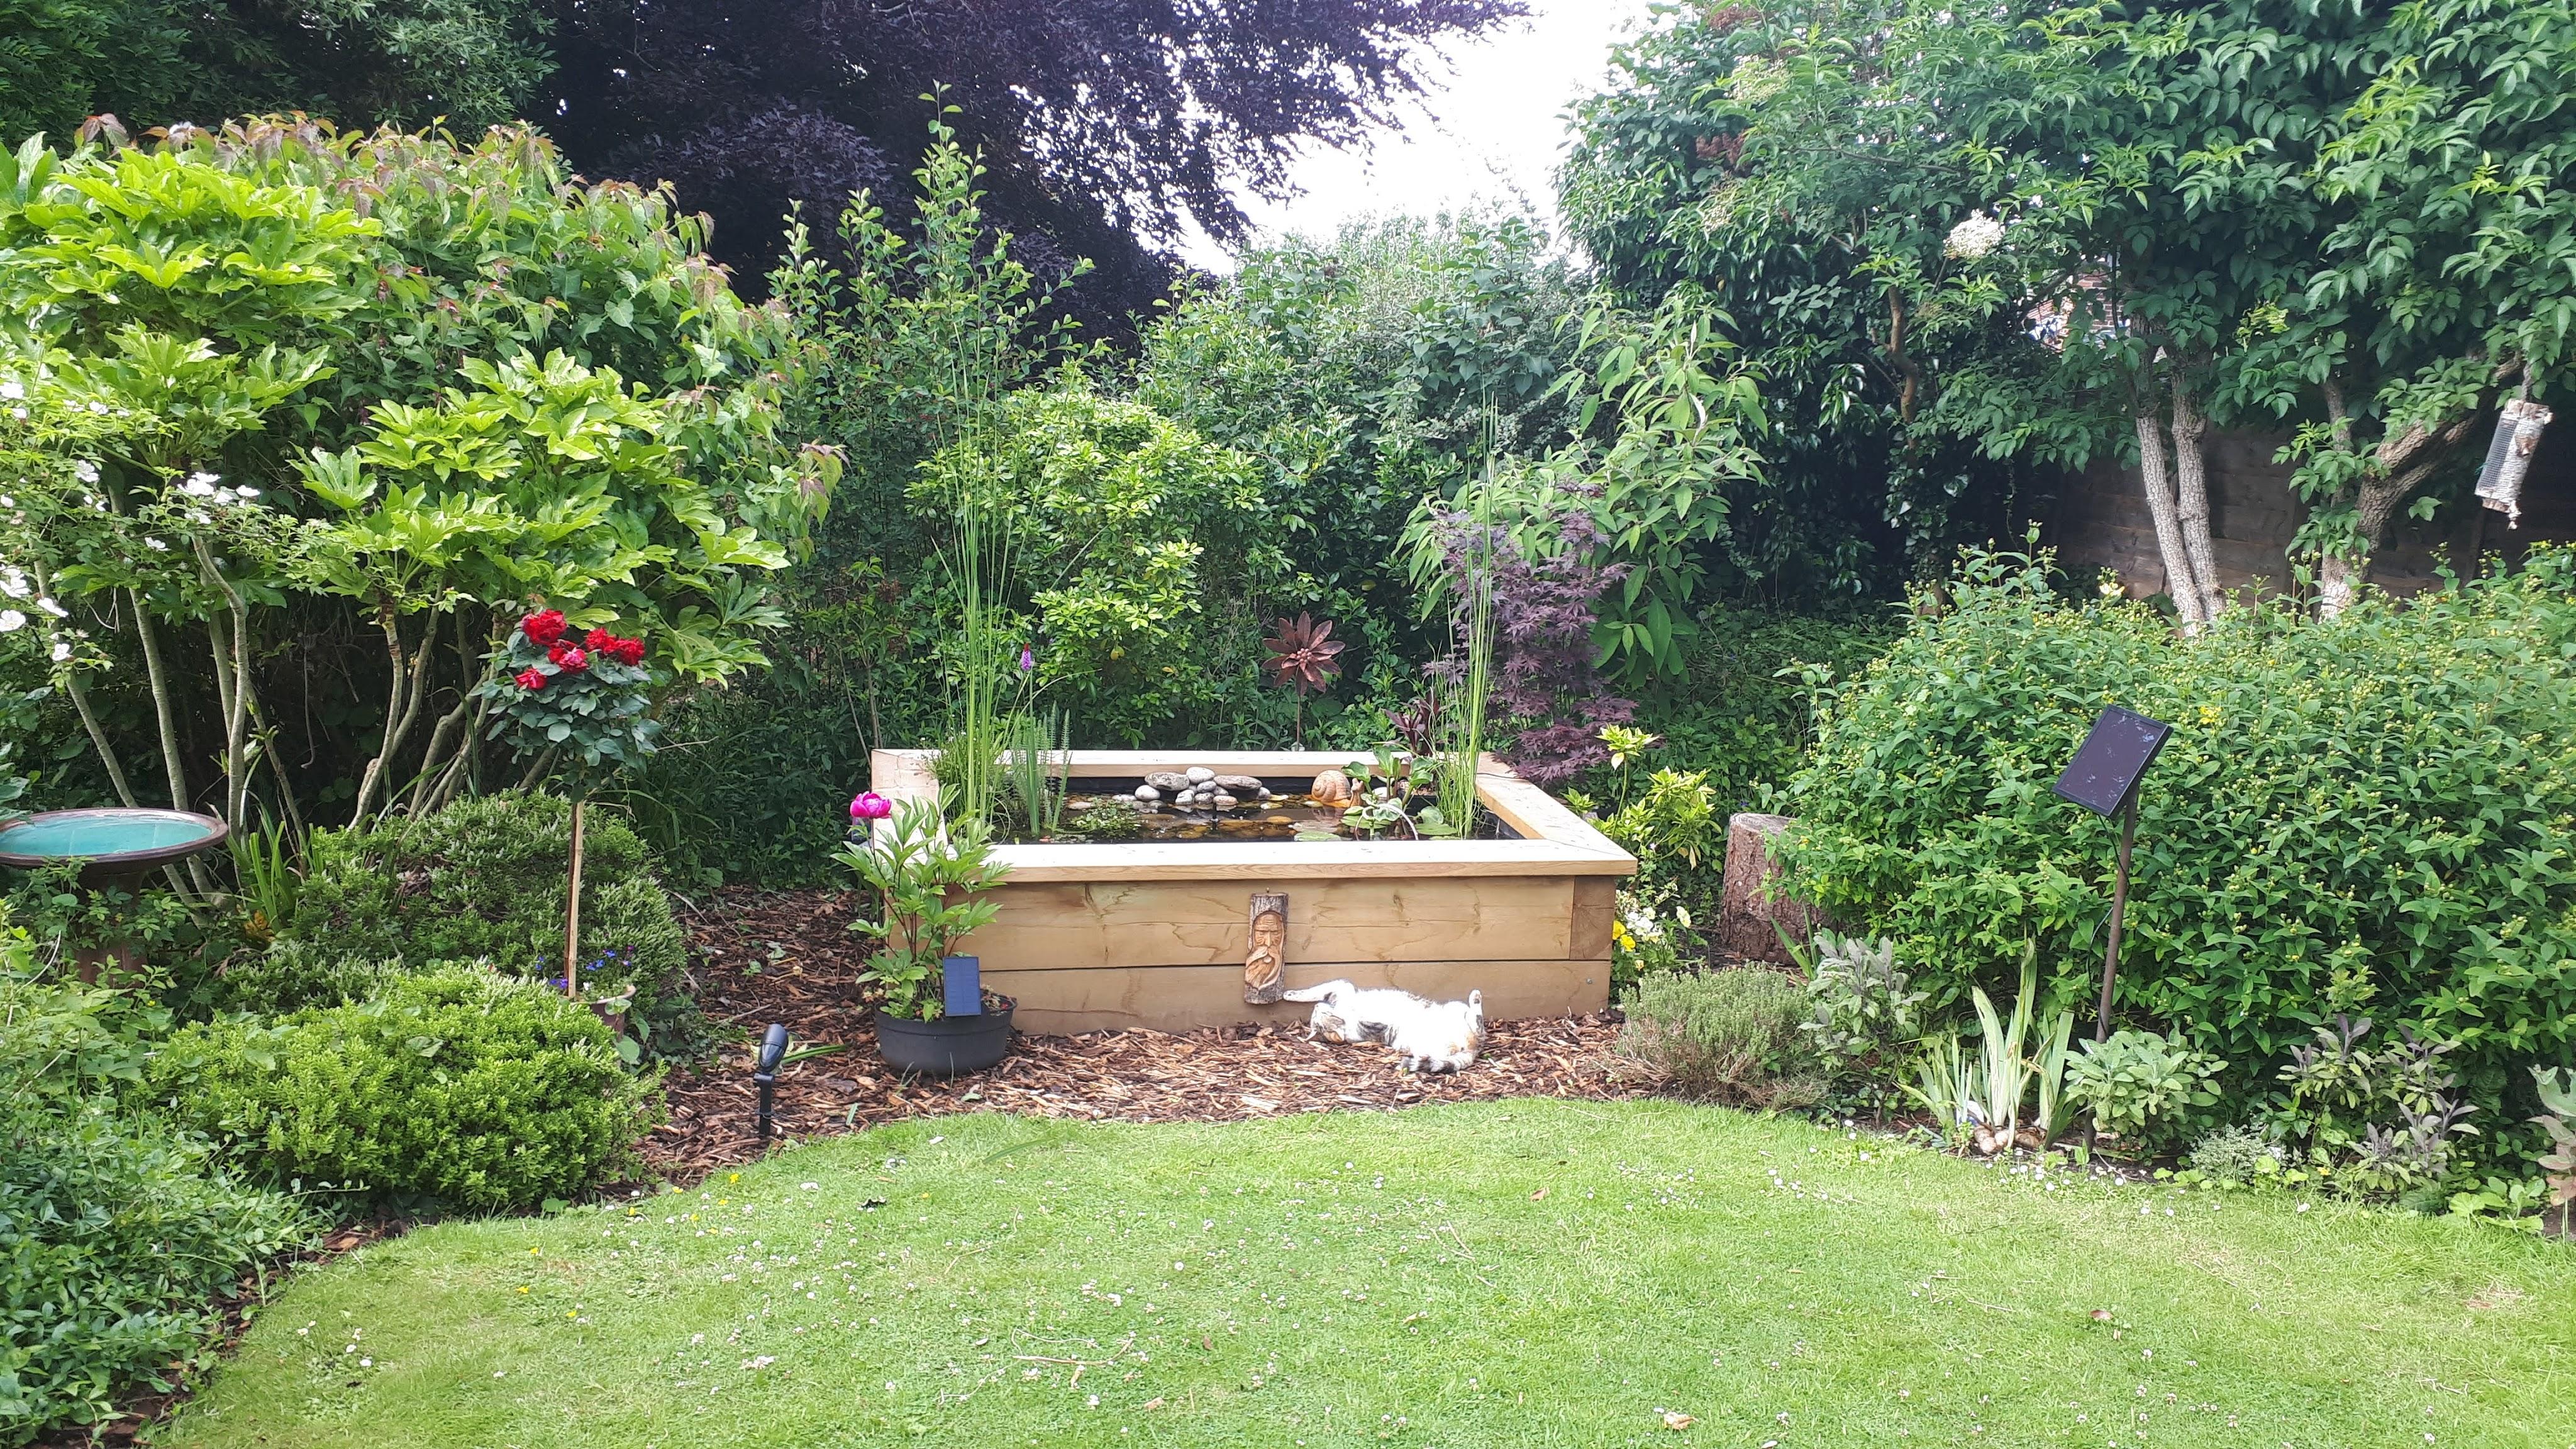 Six on Saturday: Cherries and chiffchaffs in a wildlife friendly cottage garden